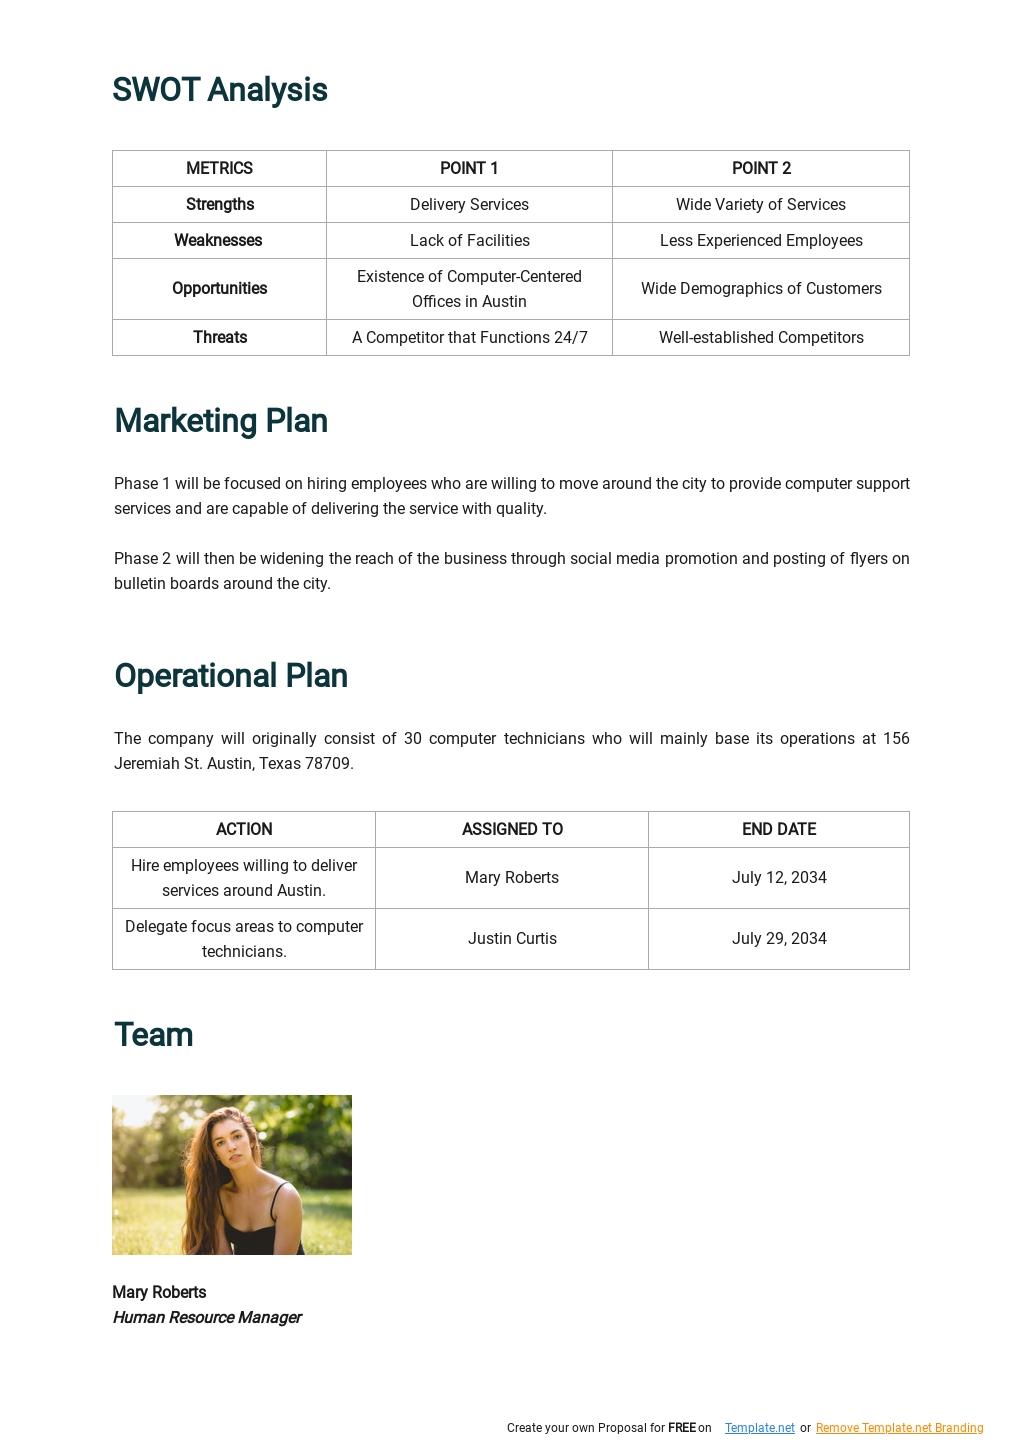 Computer Support Business Plan Template 2.jpe